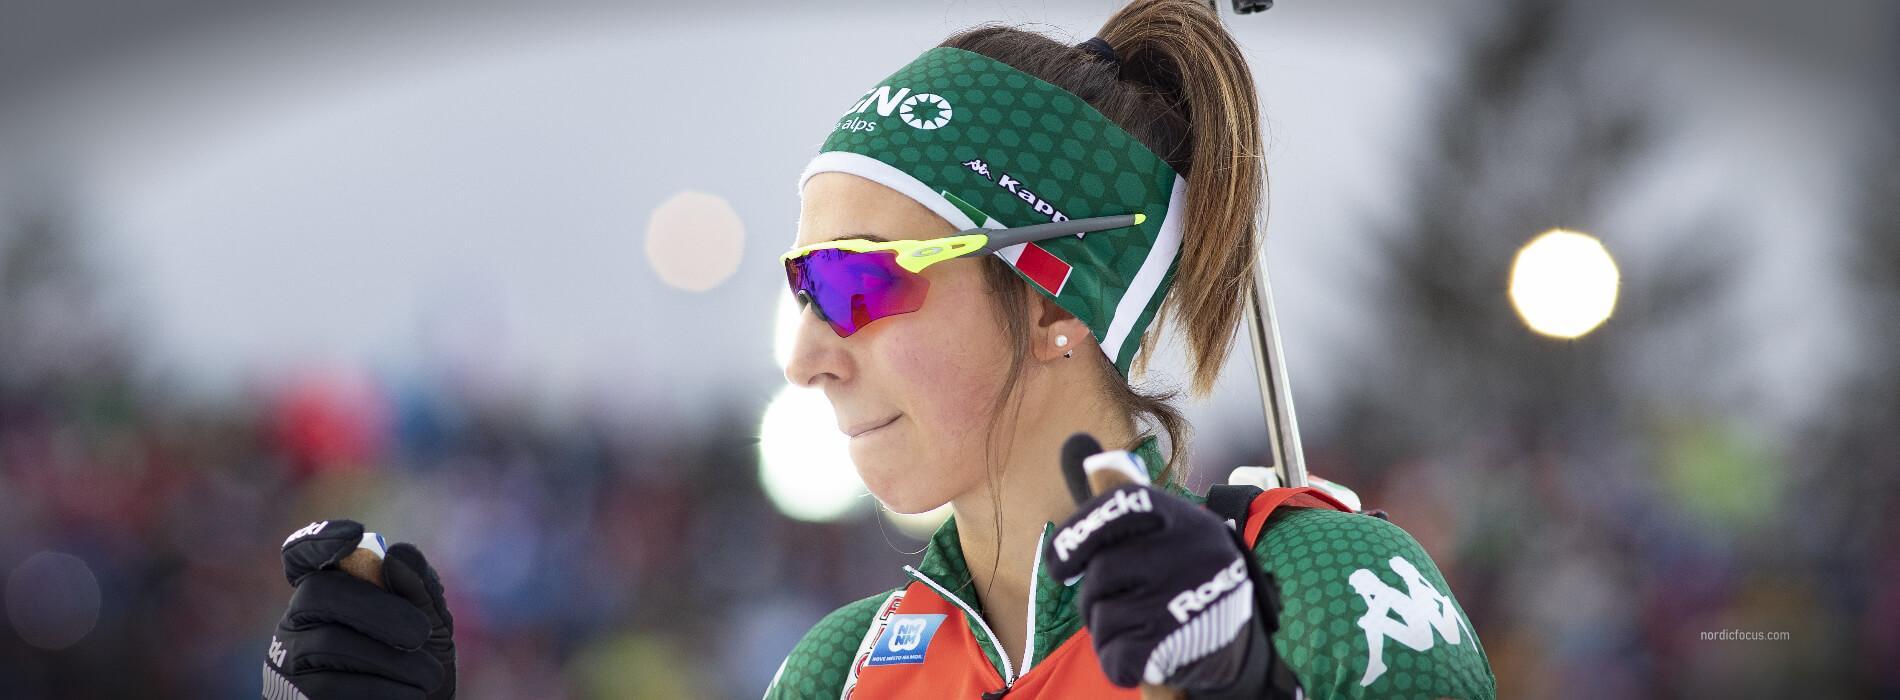 Lisa Vittozzi Oberhof Sprint 2019